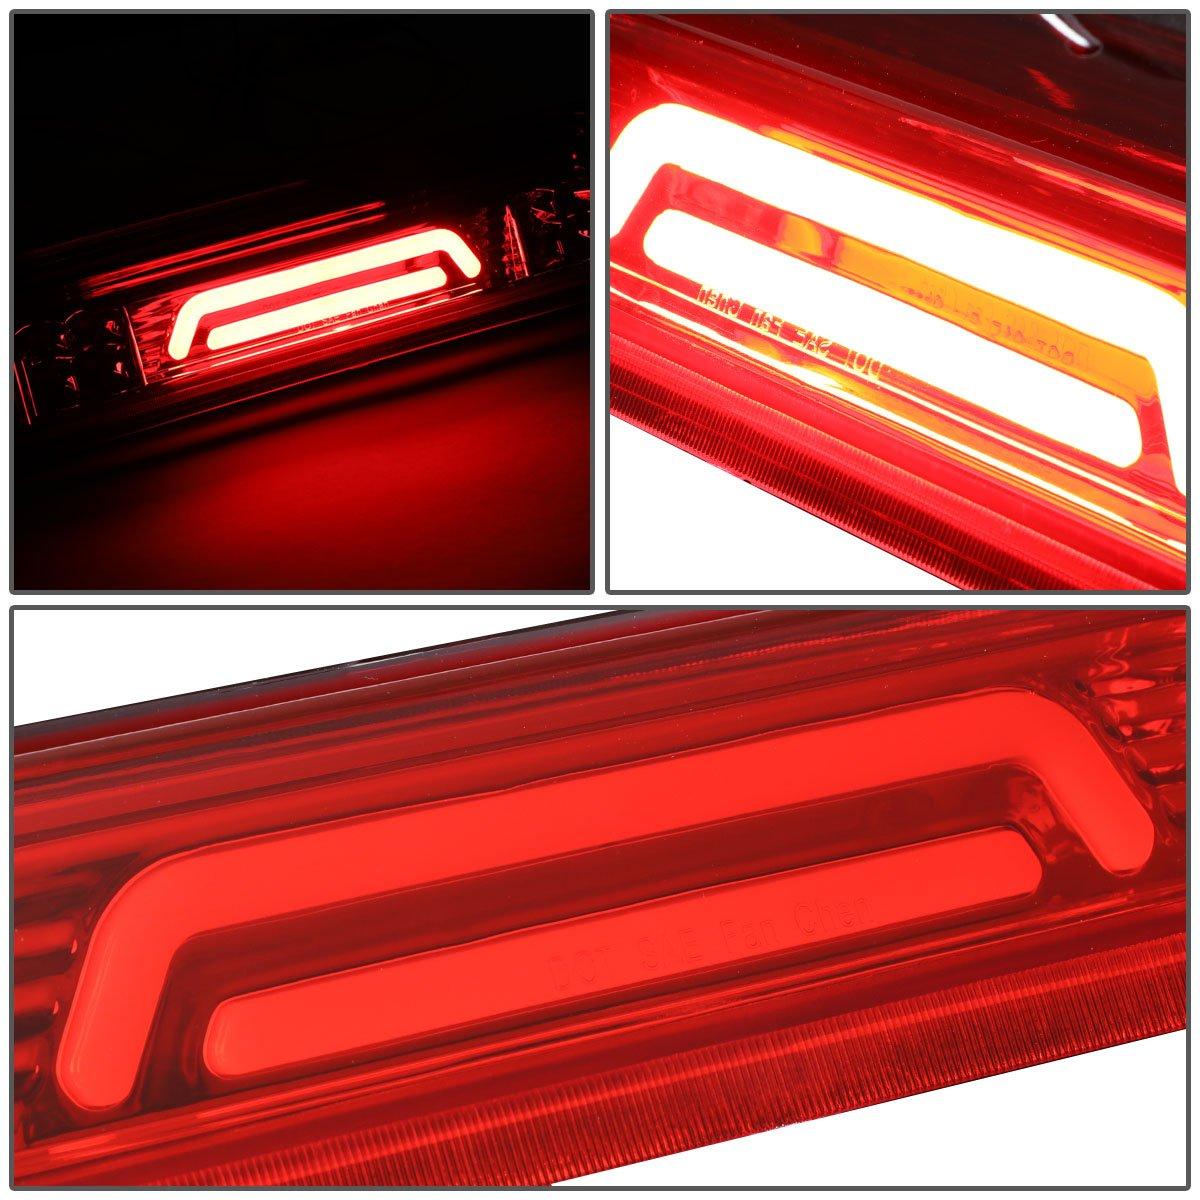 4th Chrome Housing//Smoked Lens For Ford Explorer Sport Trac//F-150 3D LED Light Bar Third Tail Brake Lamps